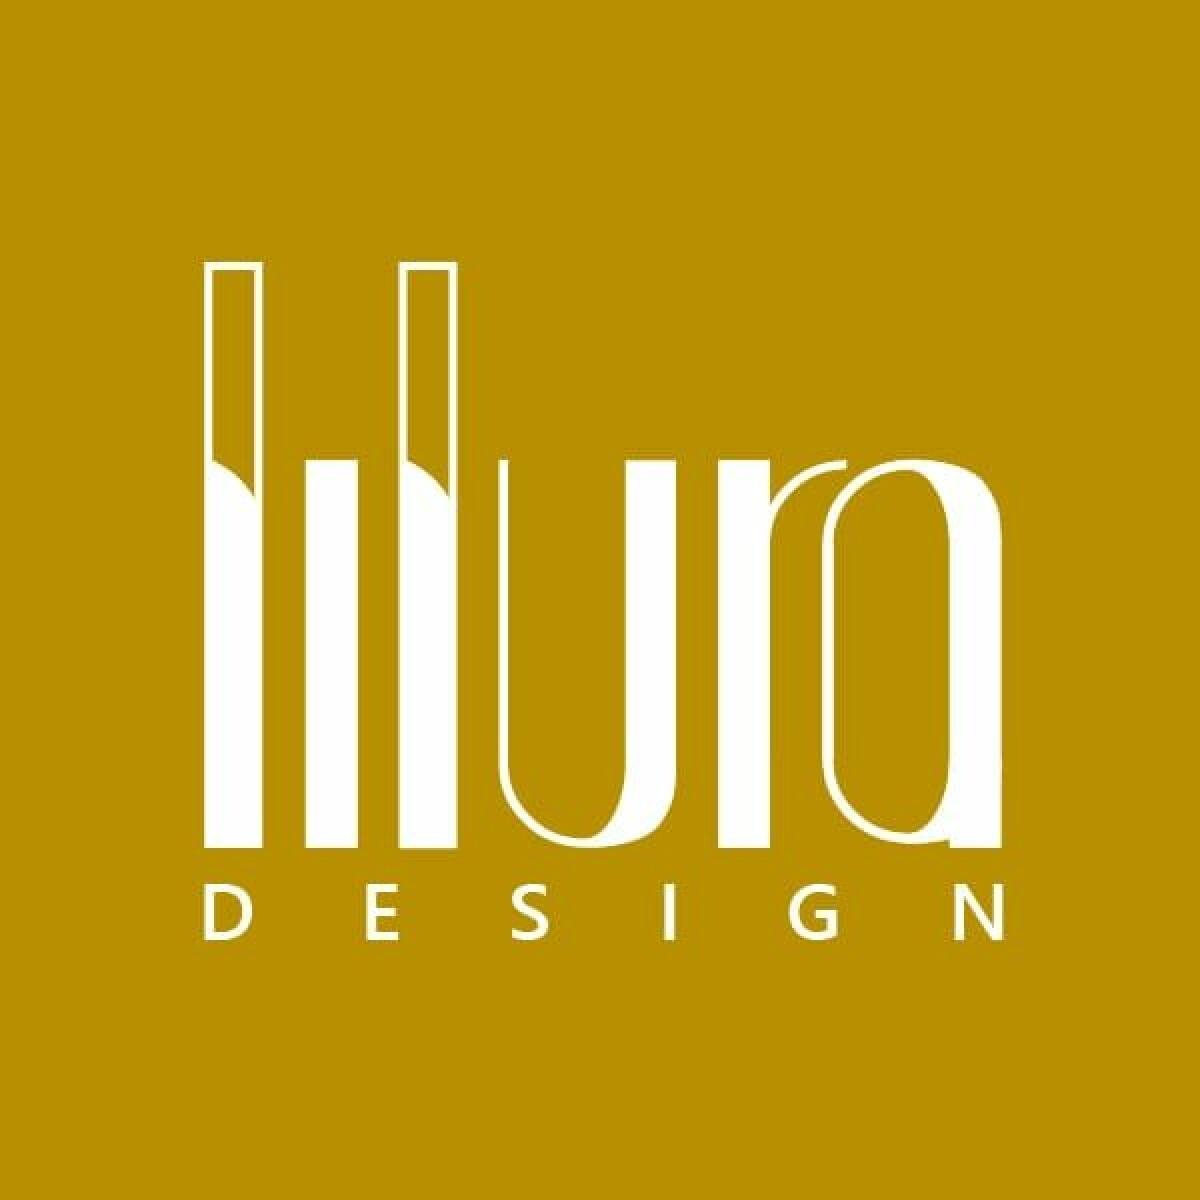 Lilura Design - @liluradesign  · Estudio de diseño de interiores